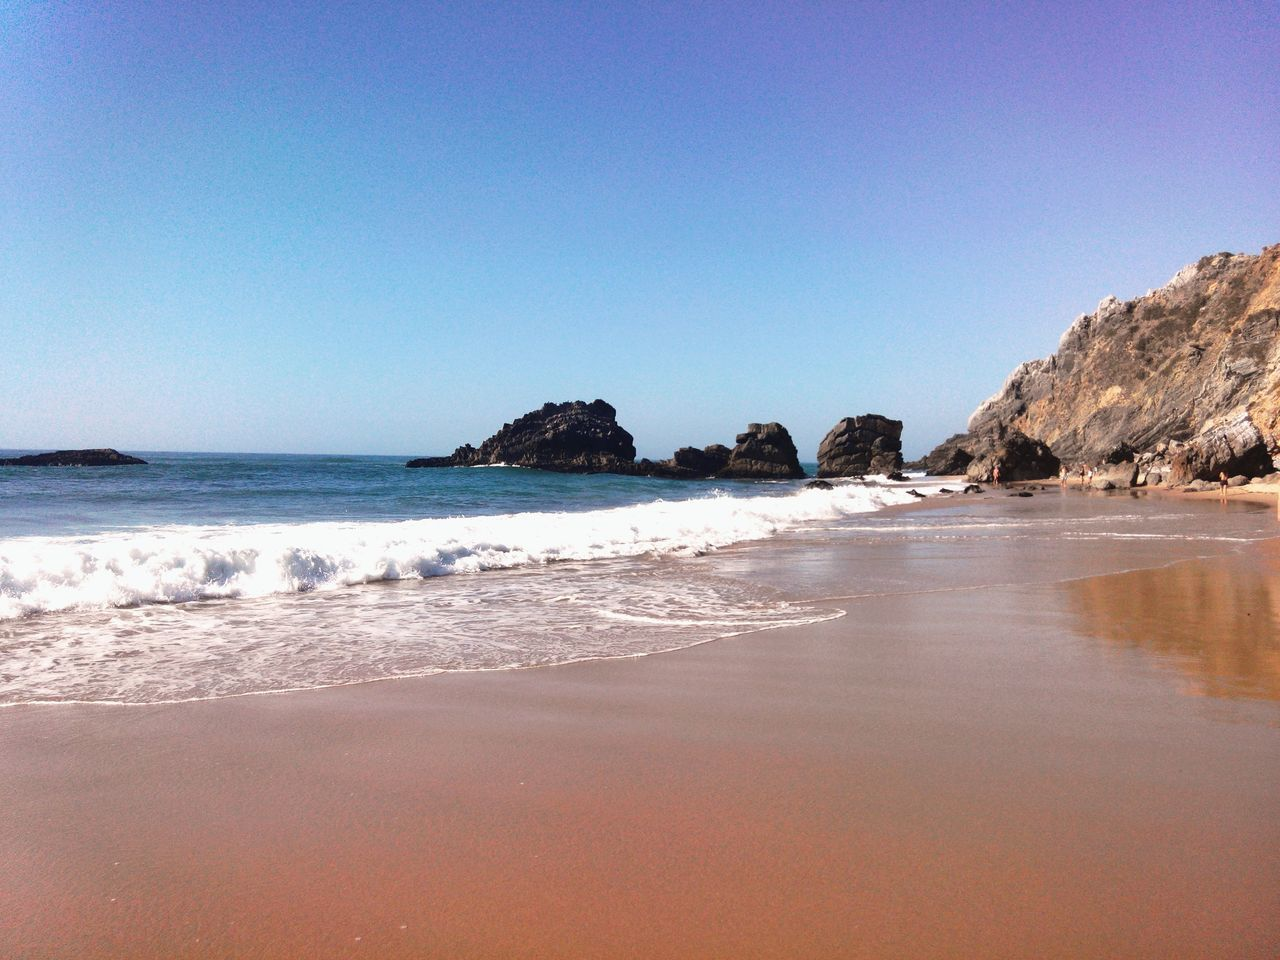 Adraga Praia Da Adraga Sandscape Beachview Beachphotography Beach Time Beachrocks Beach Beachsand Beachscape